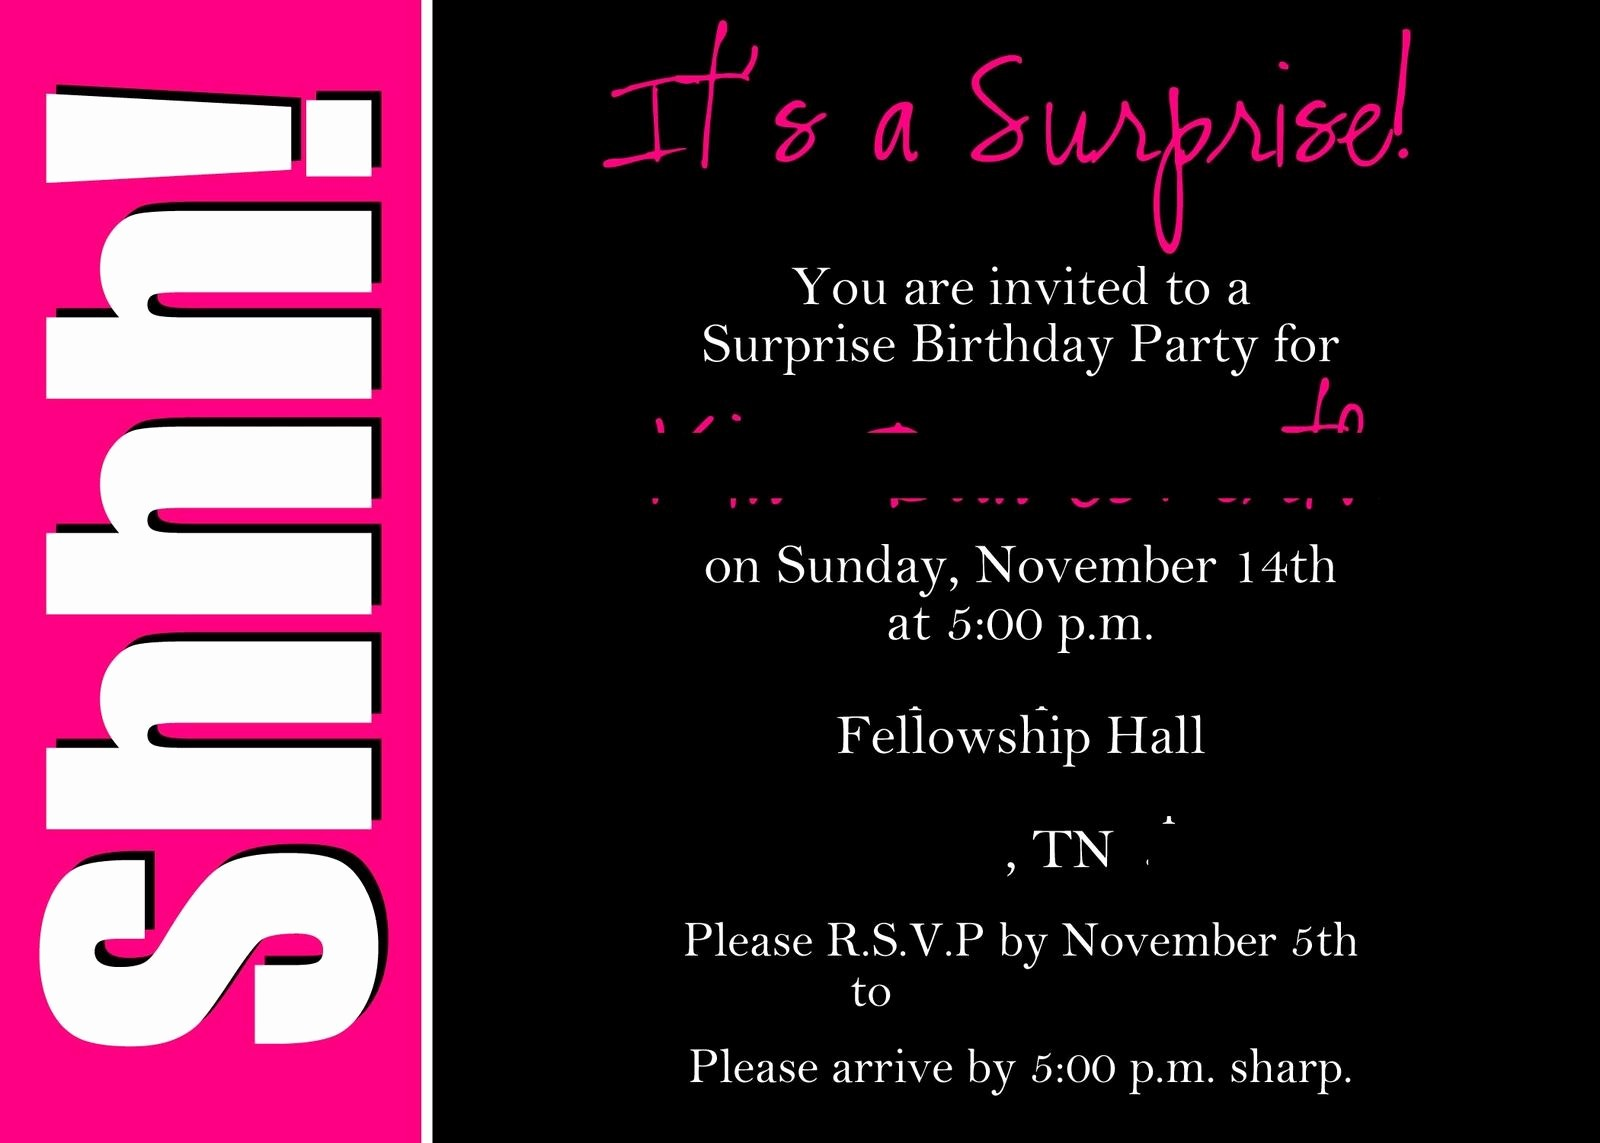 Free 40th Birthday Invitations Templates Inspirational Surprise 50th Birthday Invitations Templates